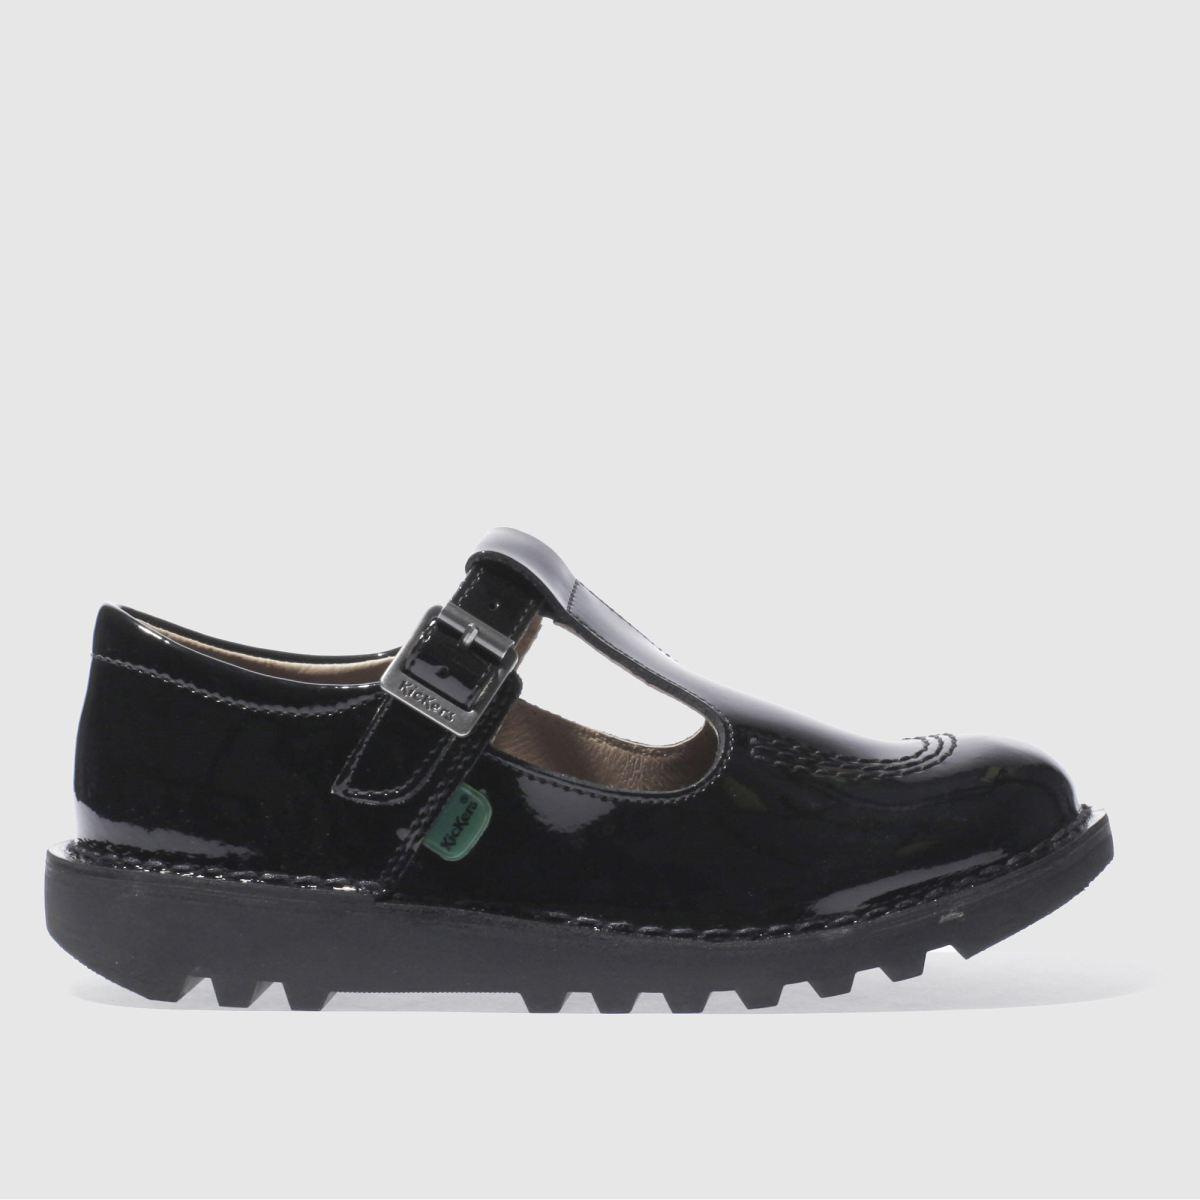 Kickers Black Kick T-bar Shoes Junior